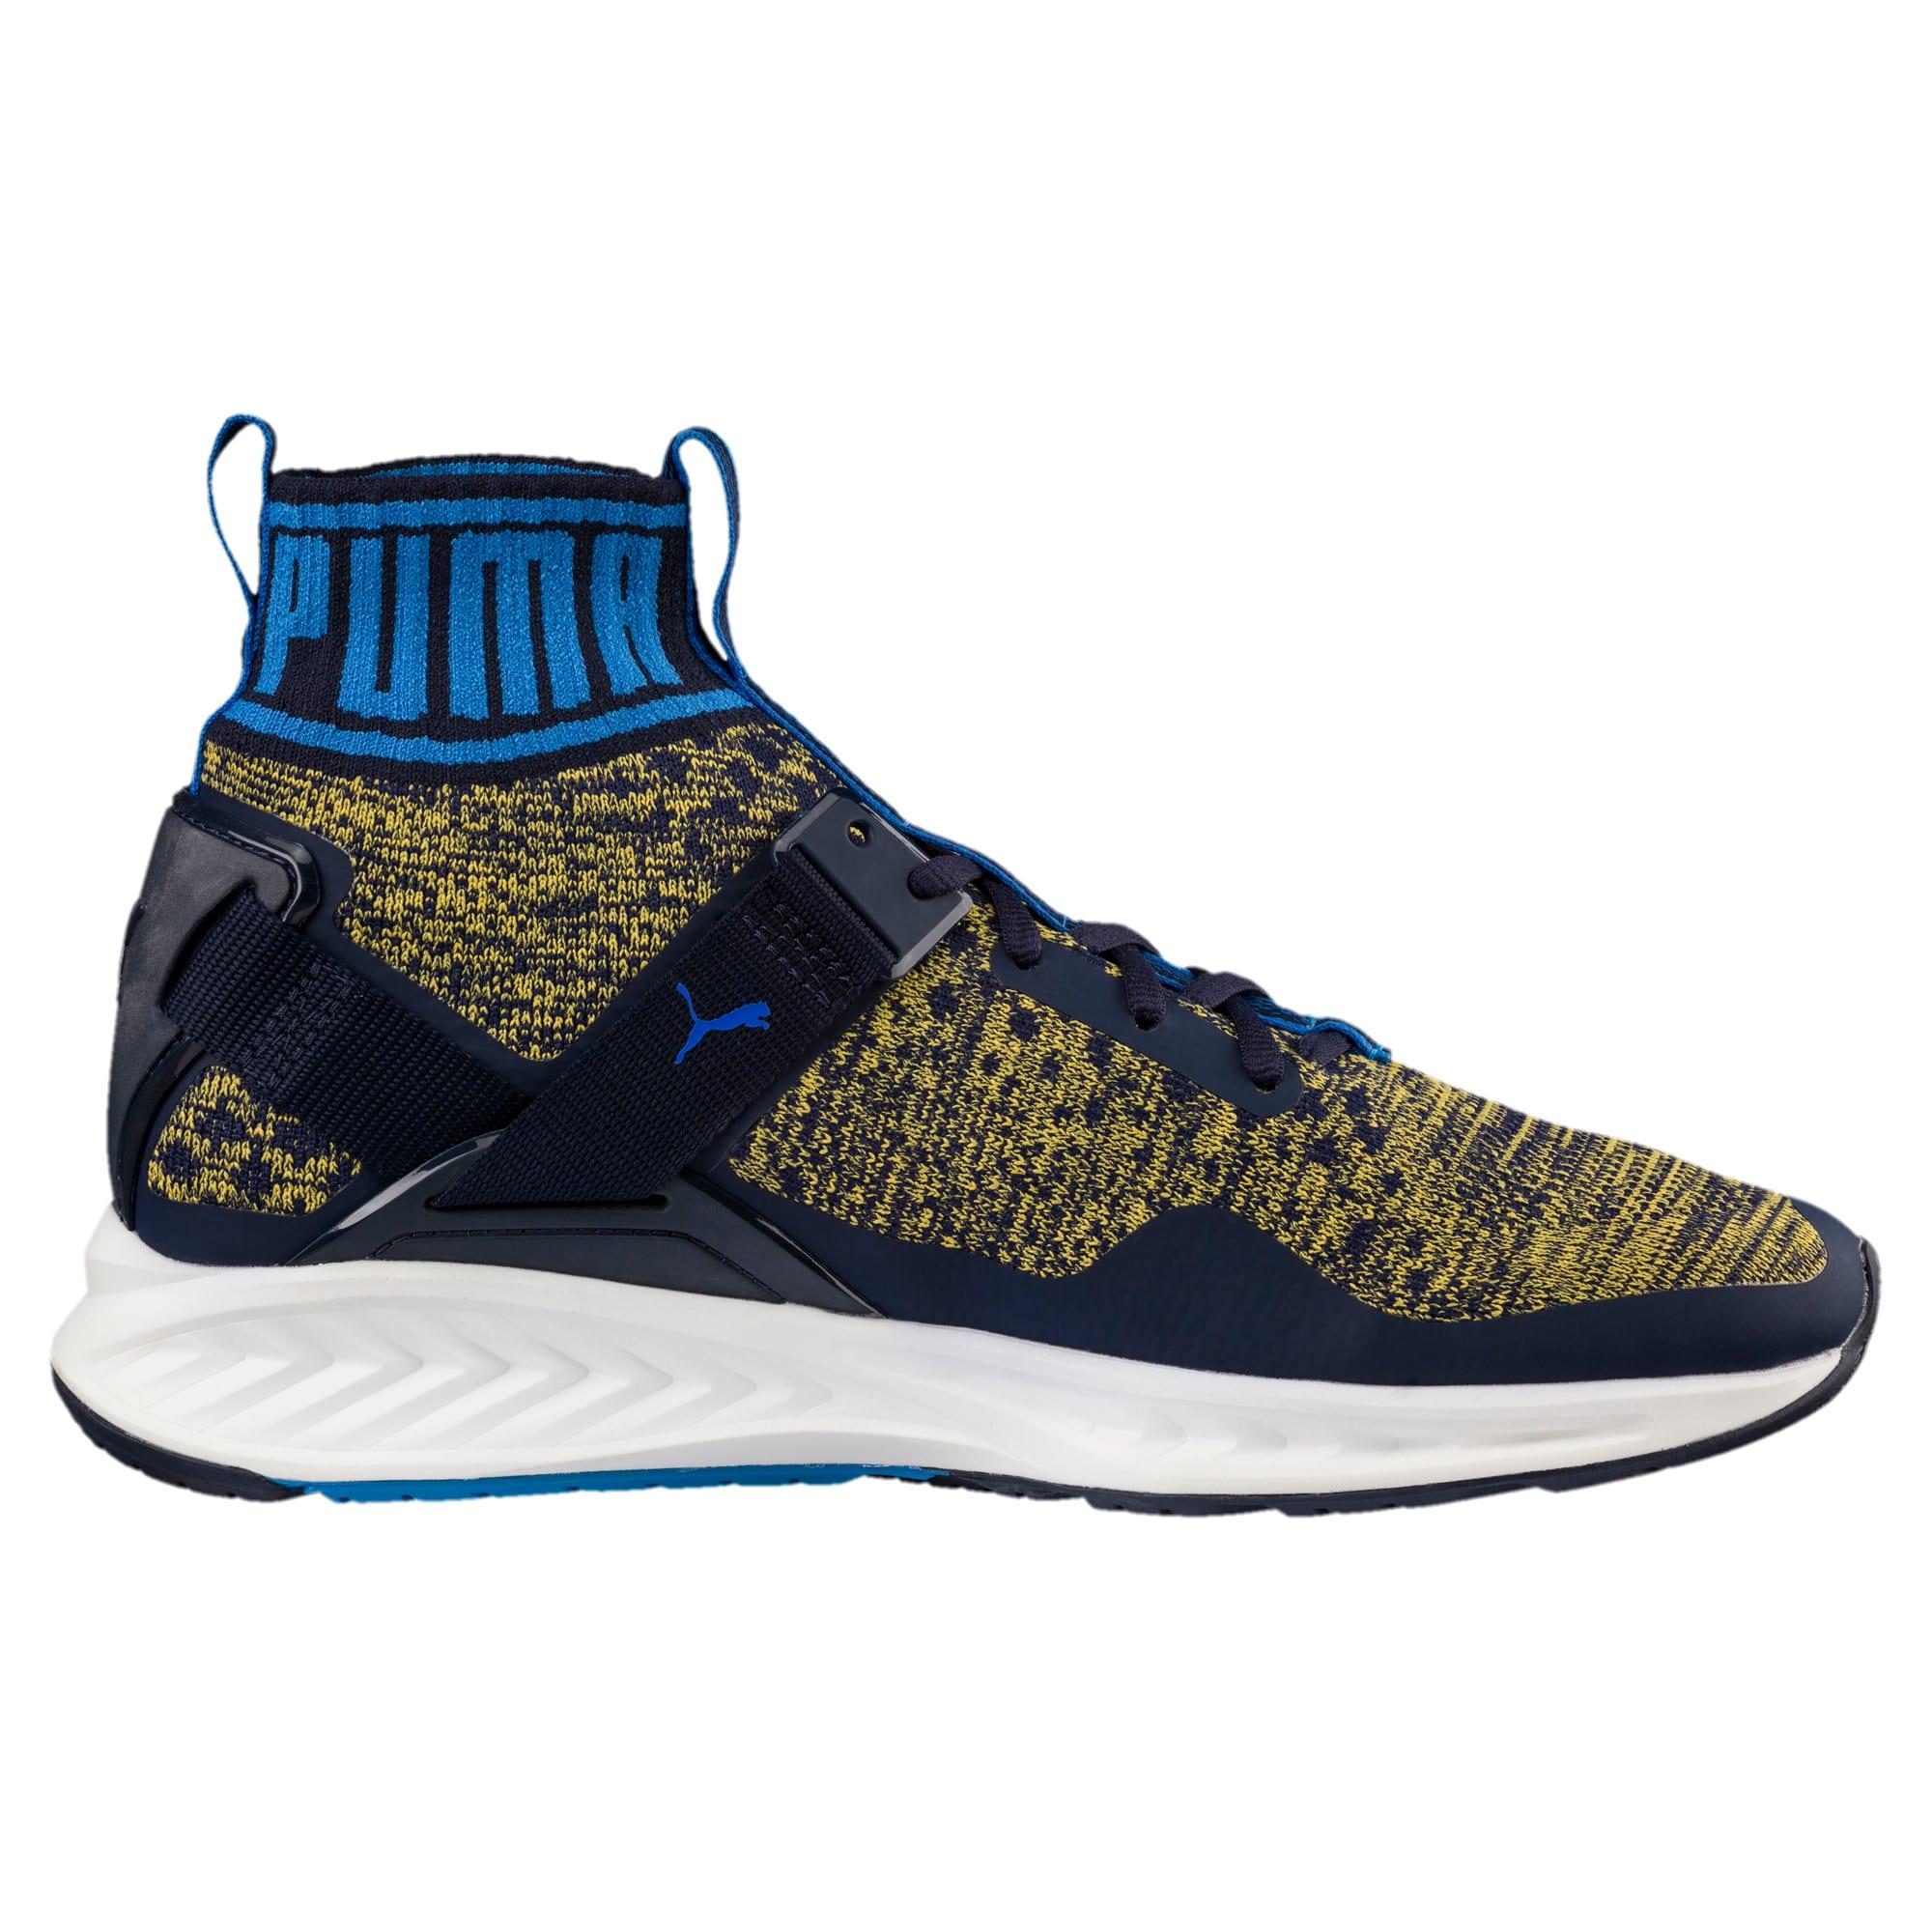 Thumbnail 3 of IGNITE evoKNIT Men's Training Shoes, Peacoat-Blue-YELLOW, medium